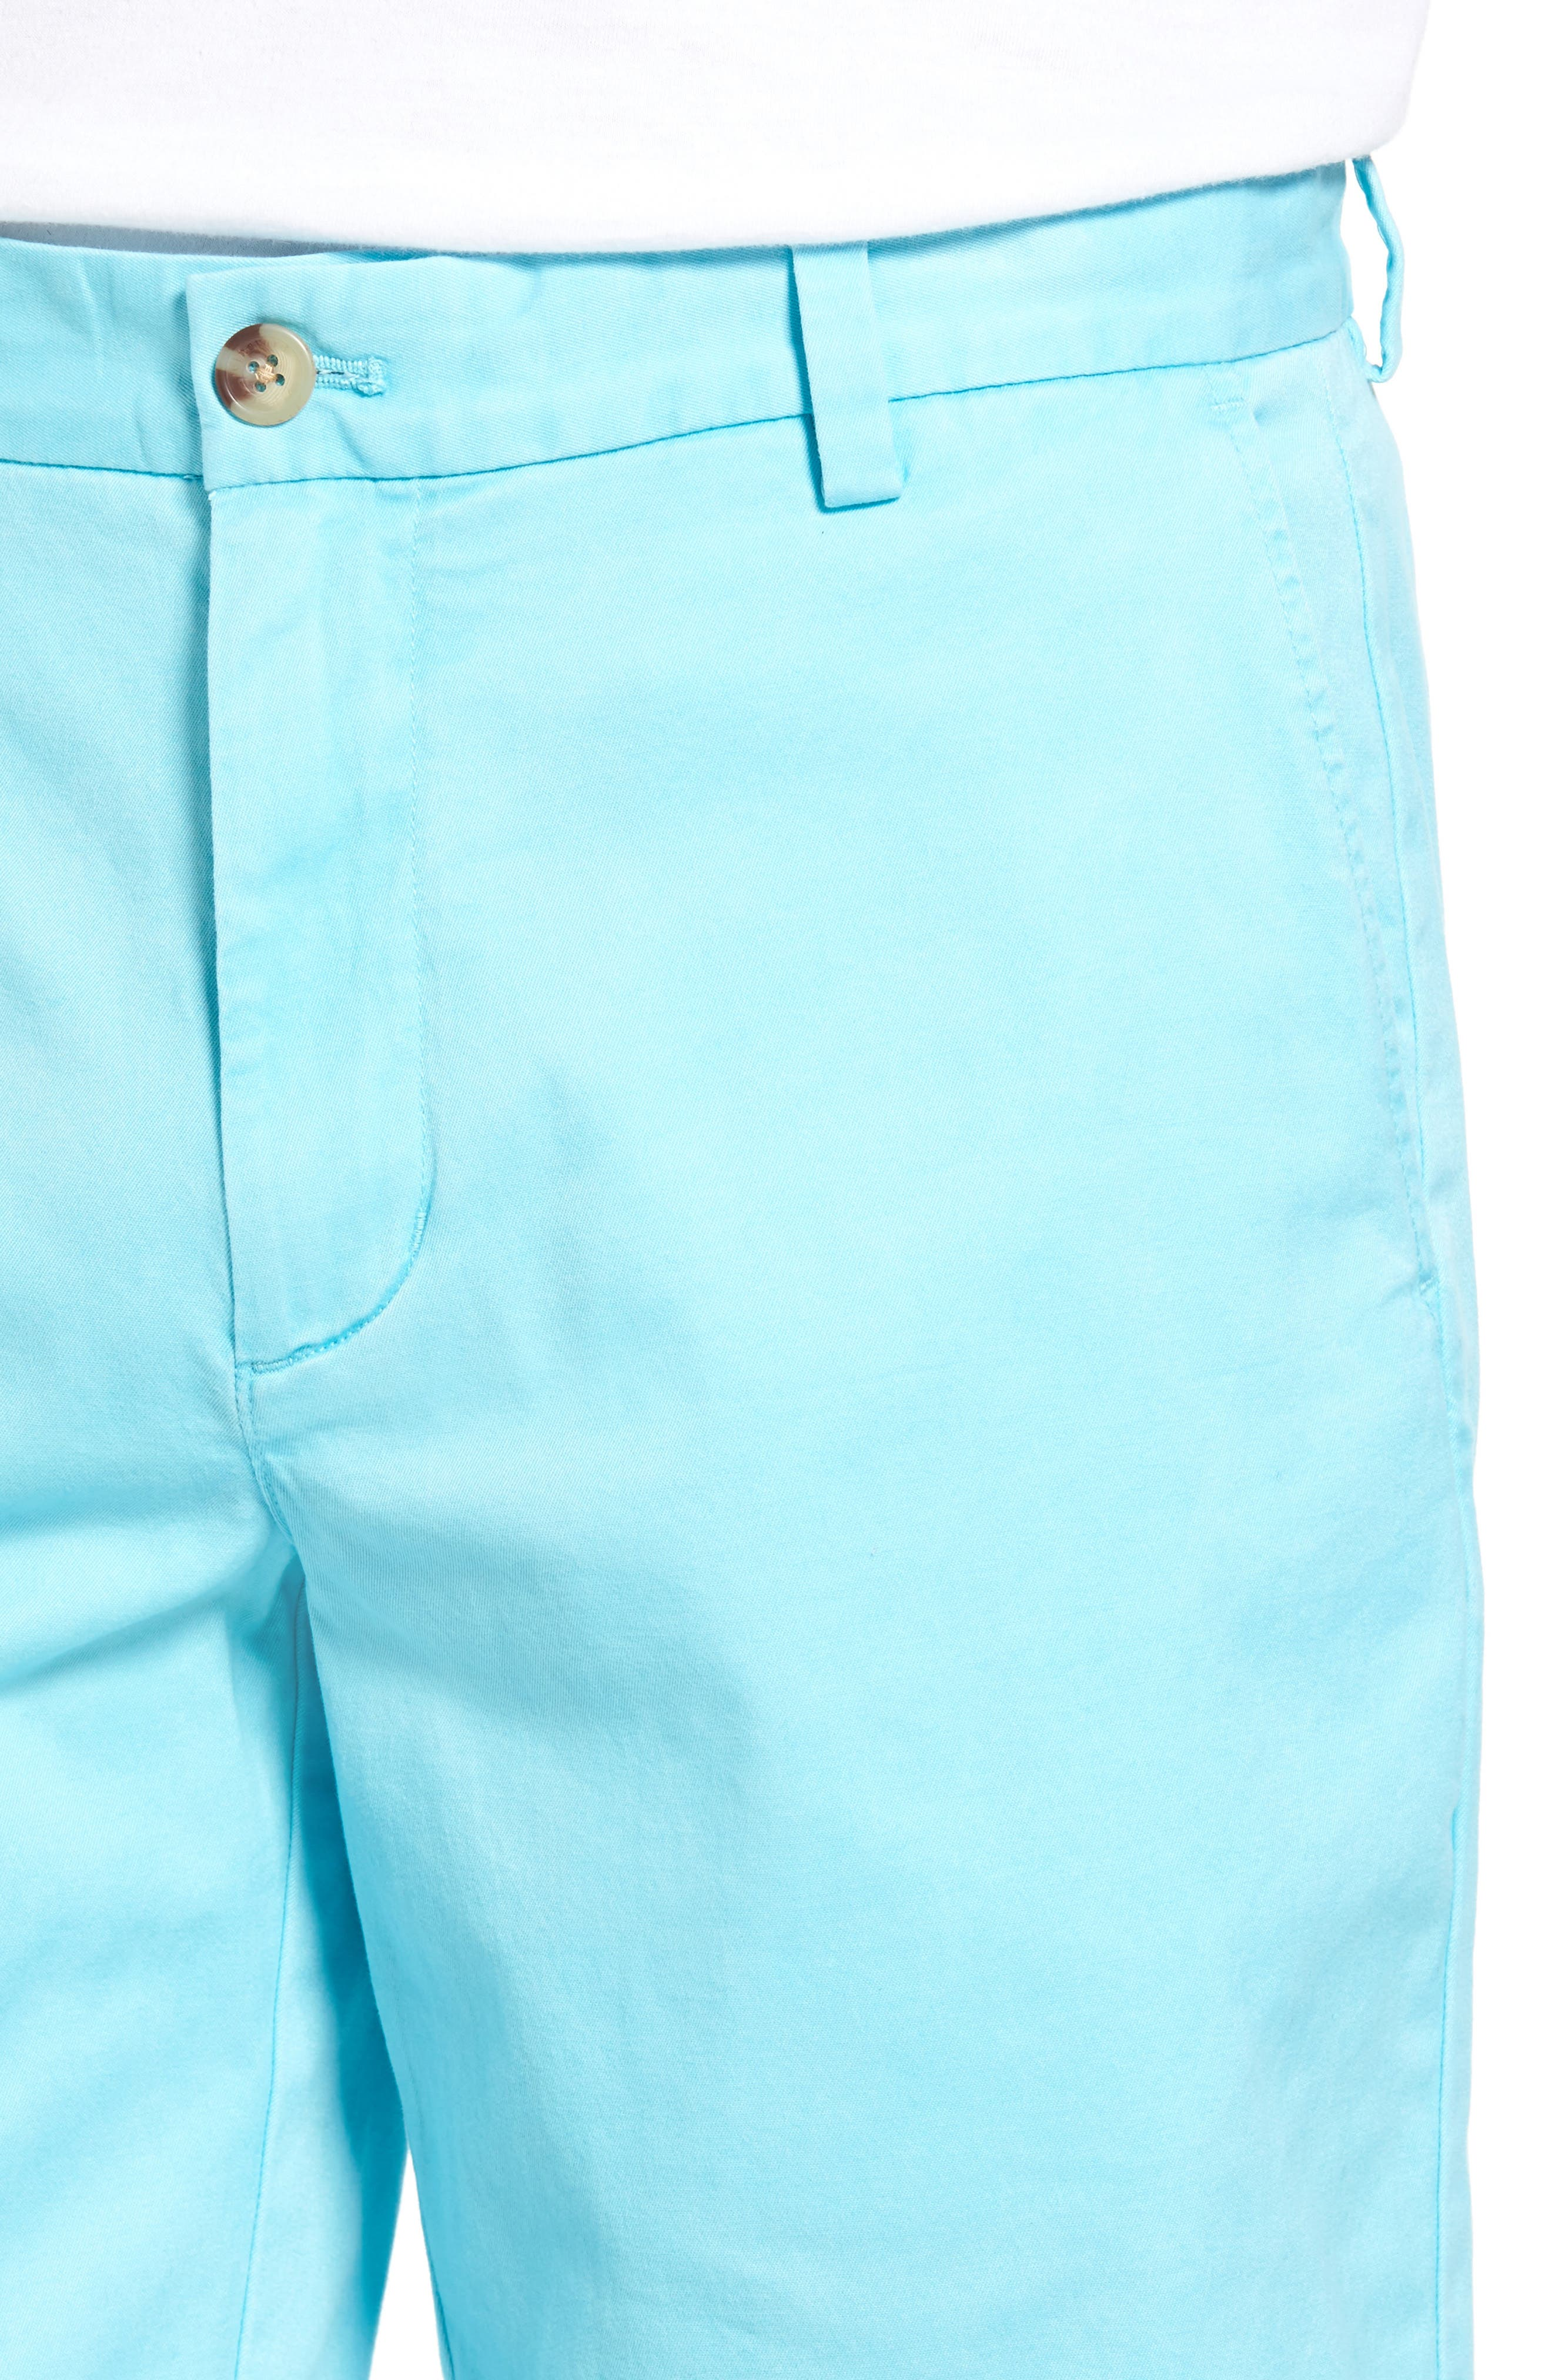 9 Inch Stretch Breaker Shorts,                             Alternate thumbnail 84, color,